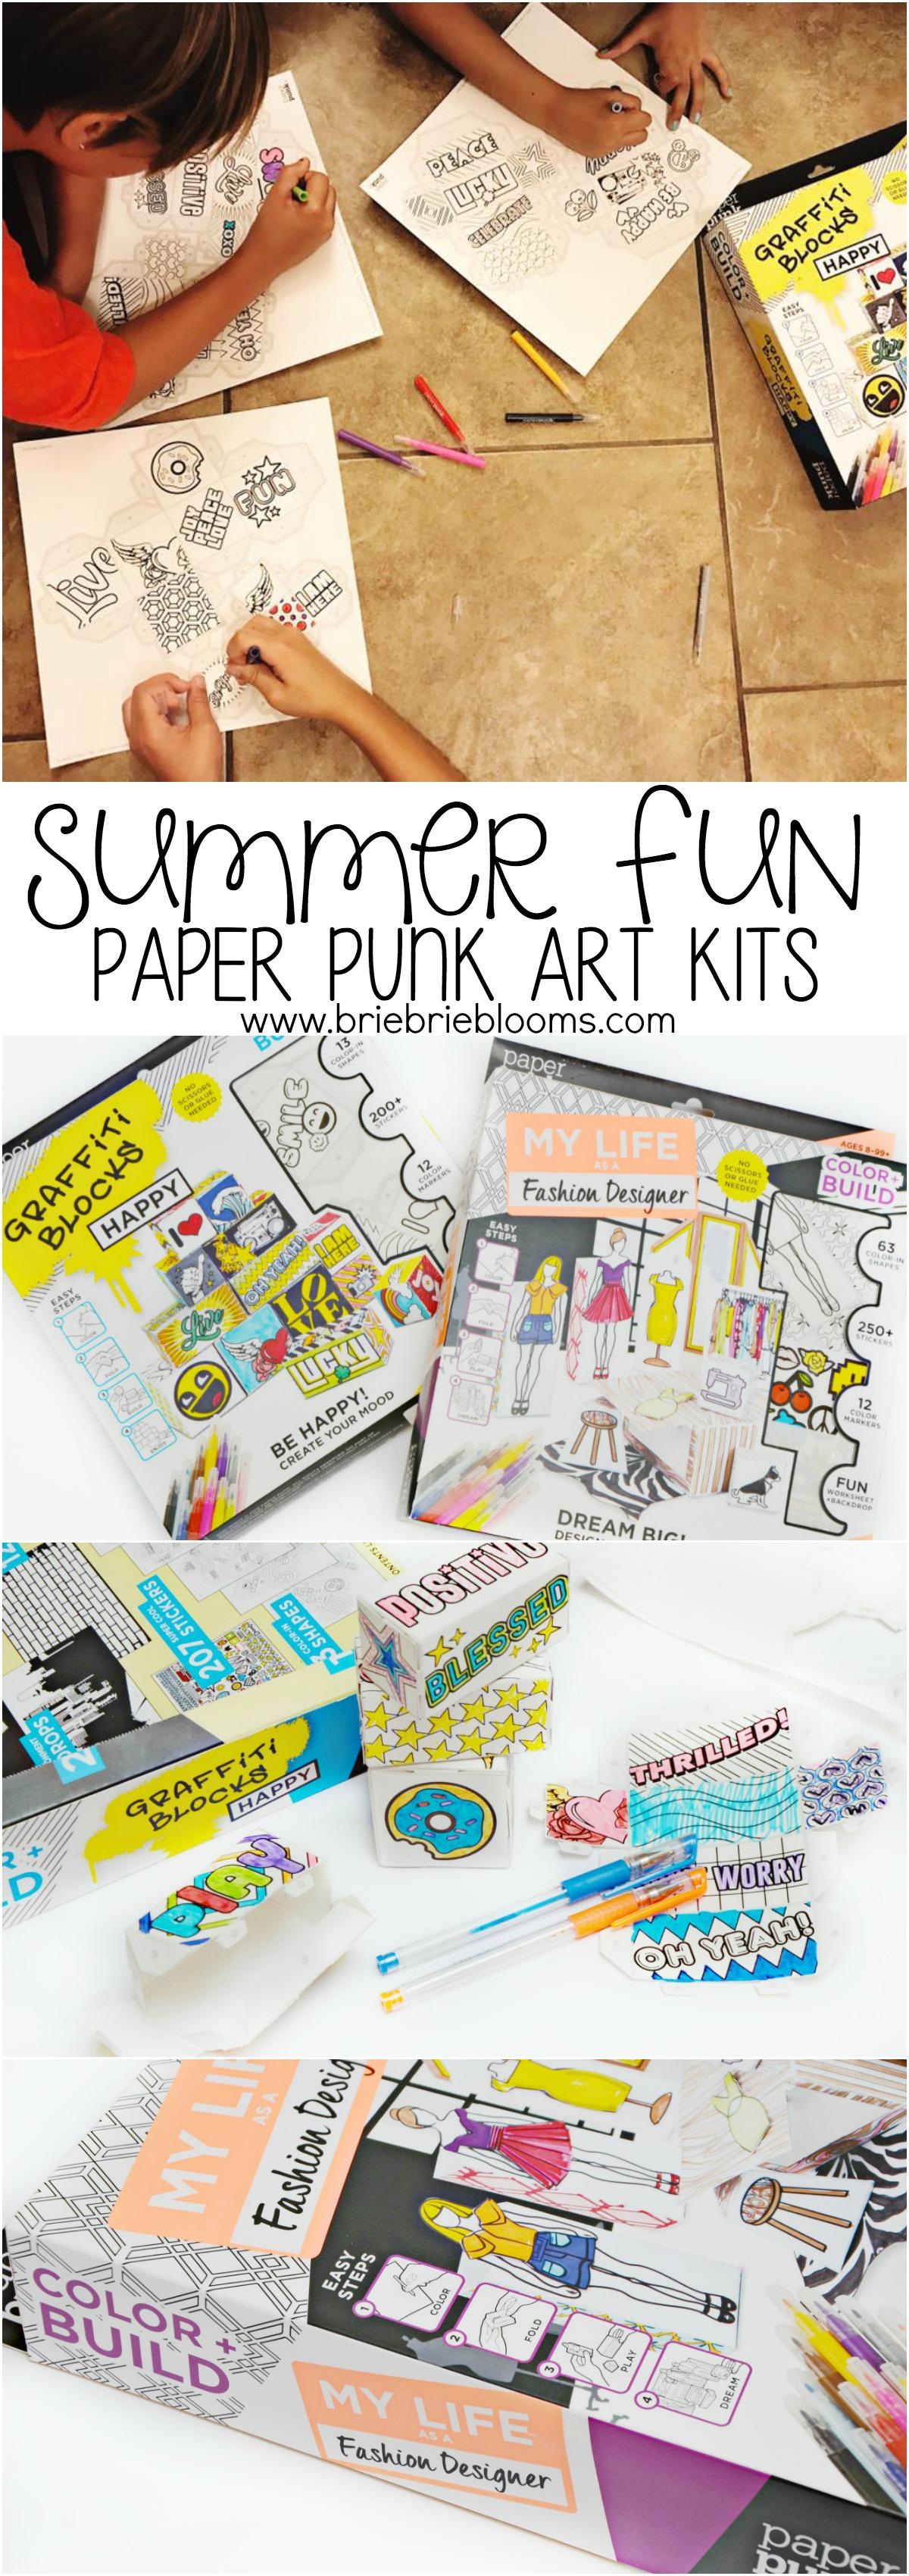 Summer Fun Paper Punk Art Kits